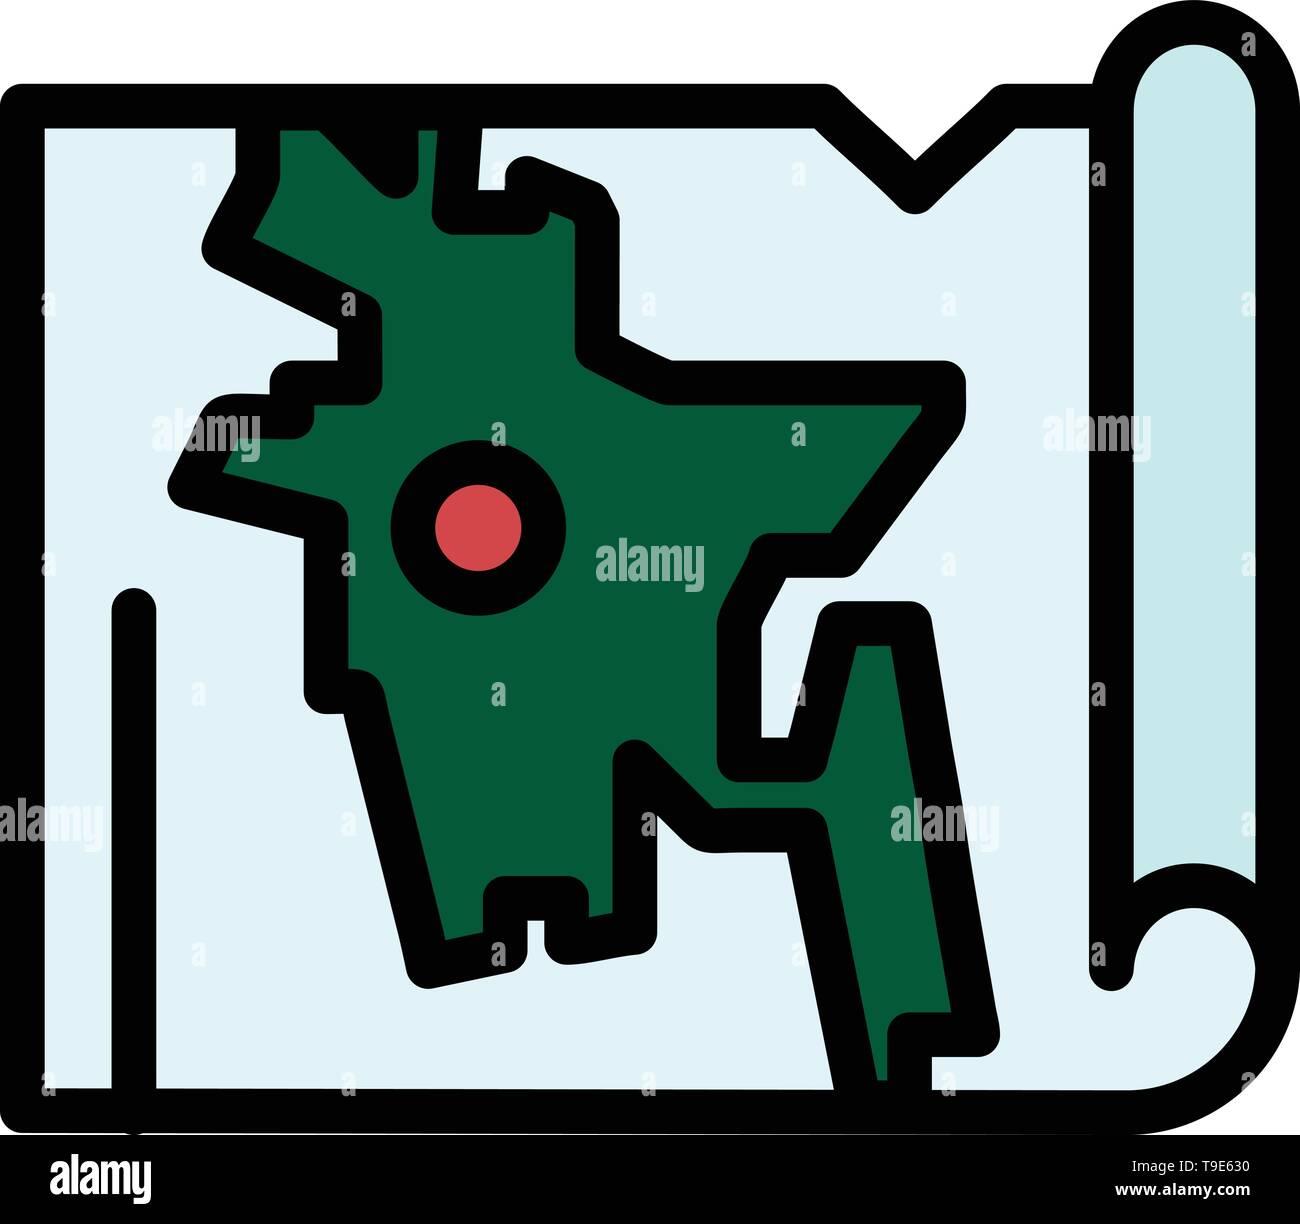 Bangladesh, Map, World, Bangla Business Logo Template. Flat Color - Stock Image